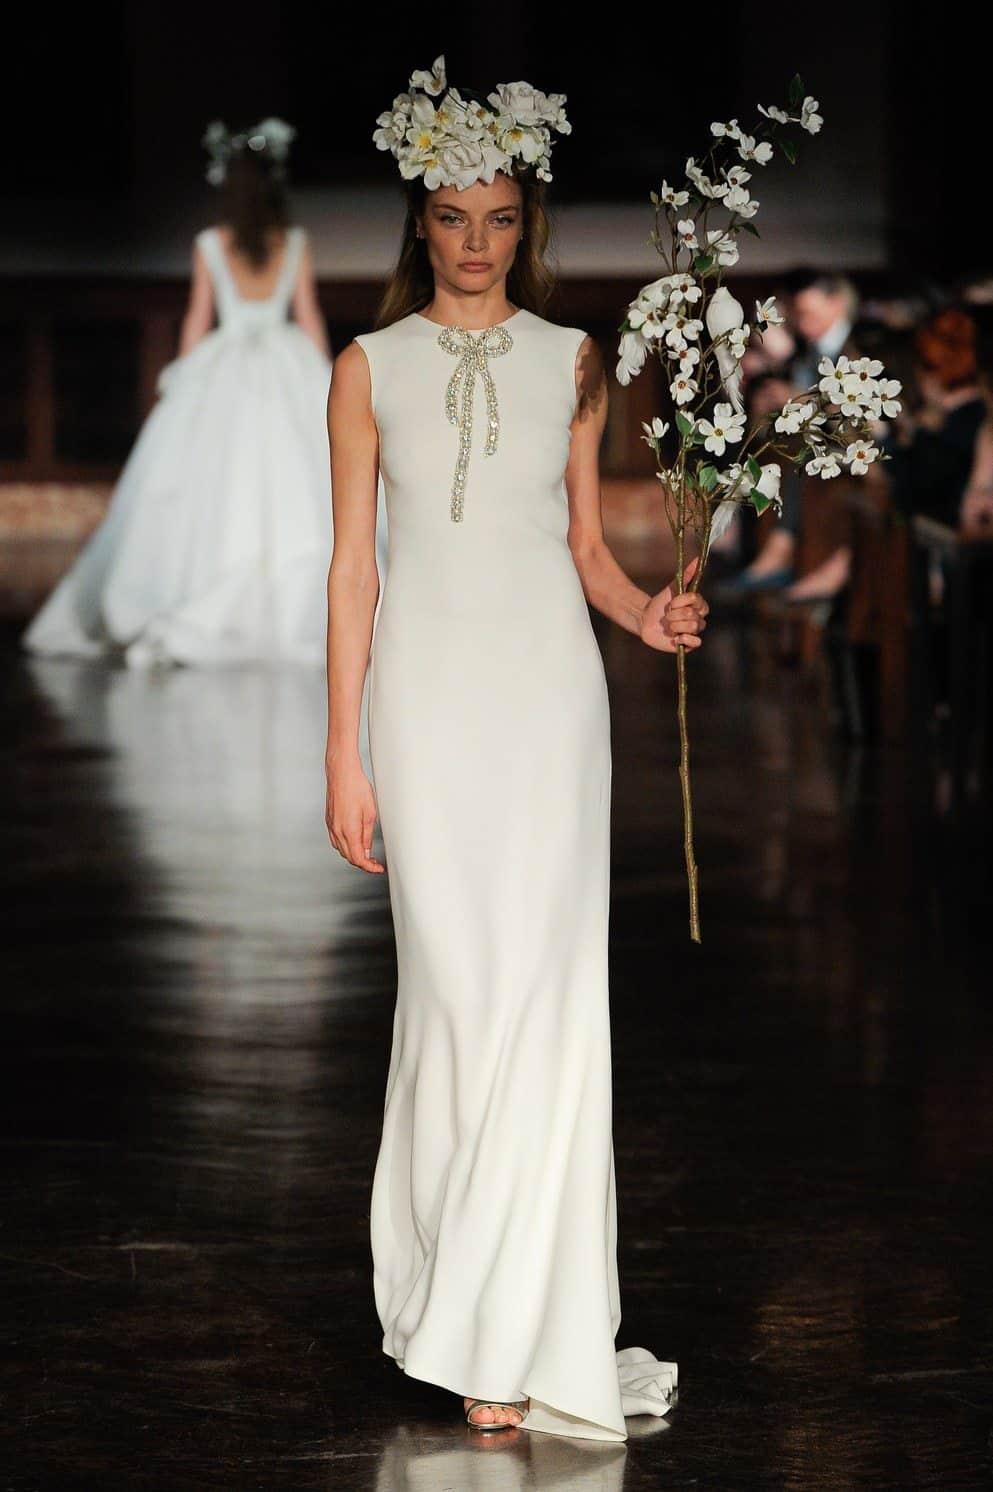 minimalismo-reem-acra-wedding-dresses-spring-2019-006-1